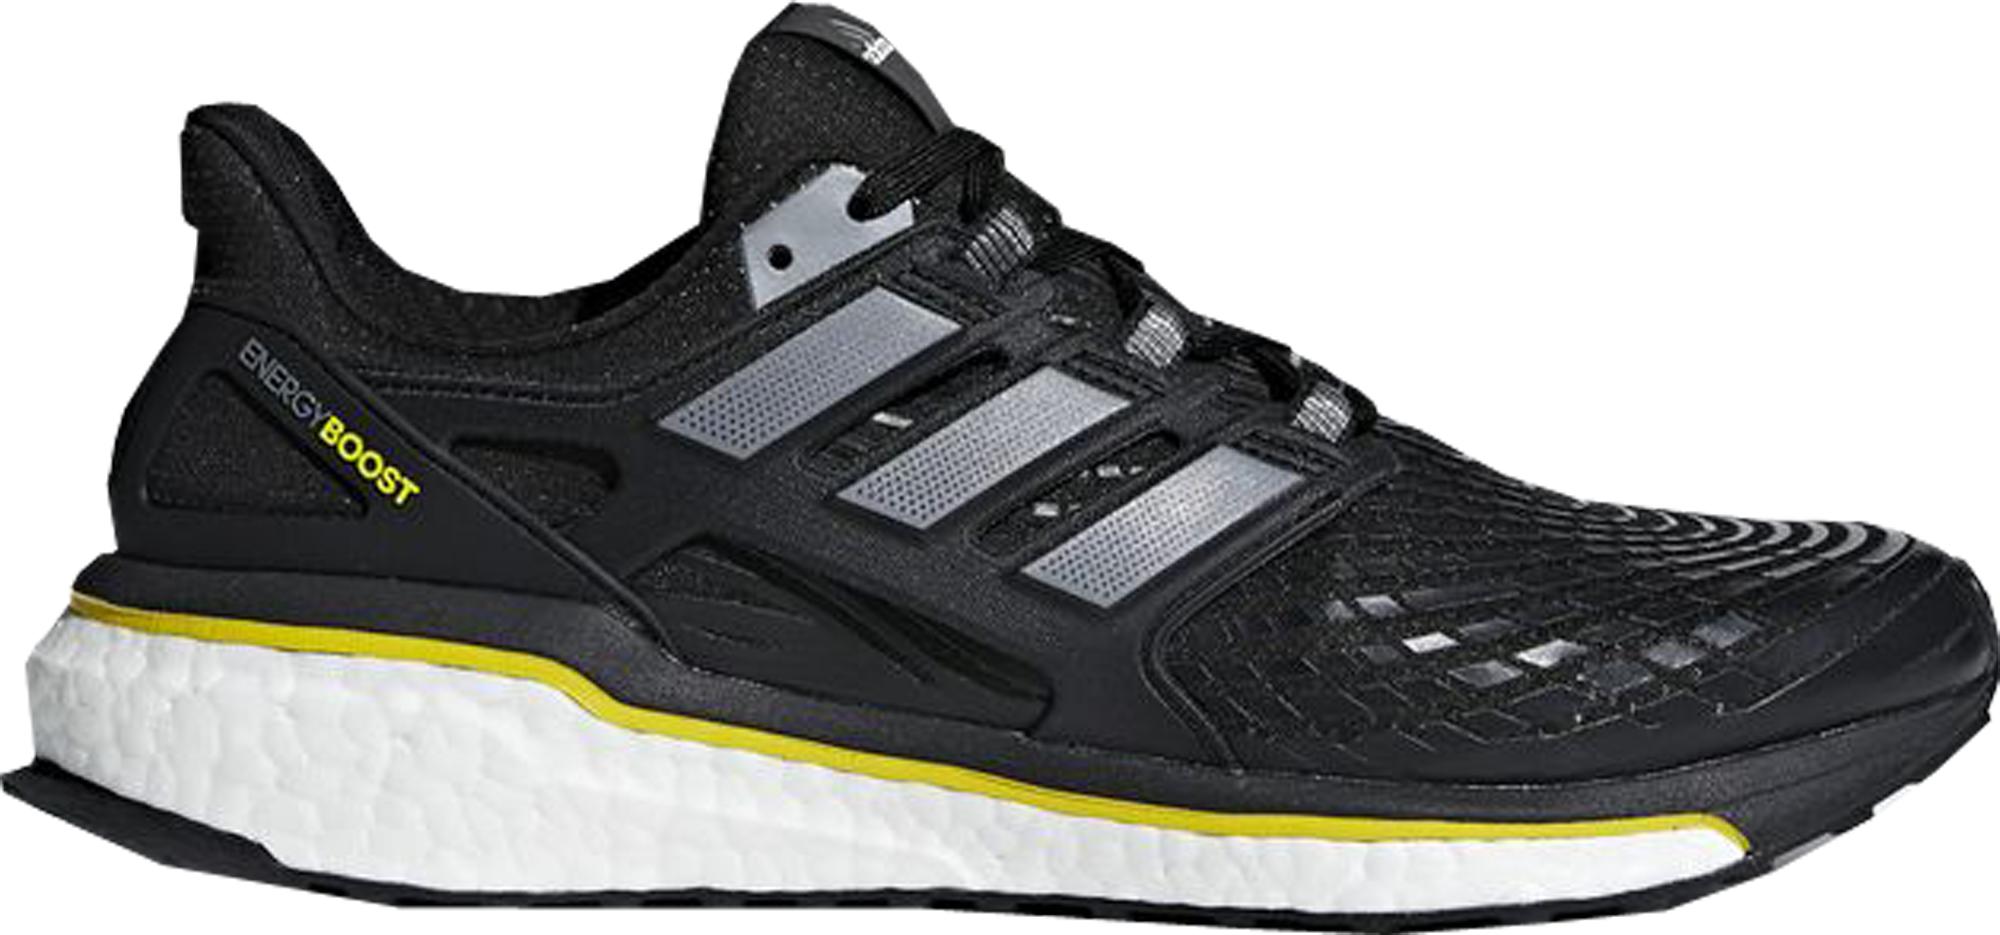 adidas Energy Boost 5th Anniversary Black Yellow